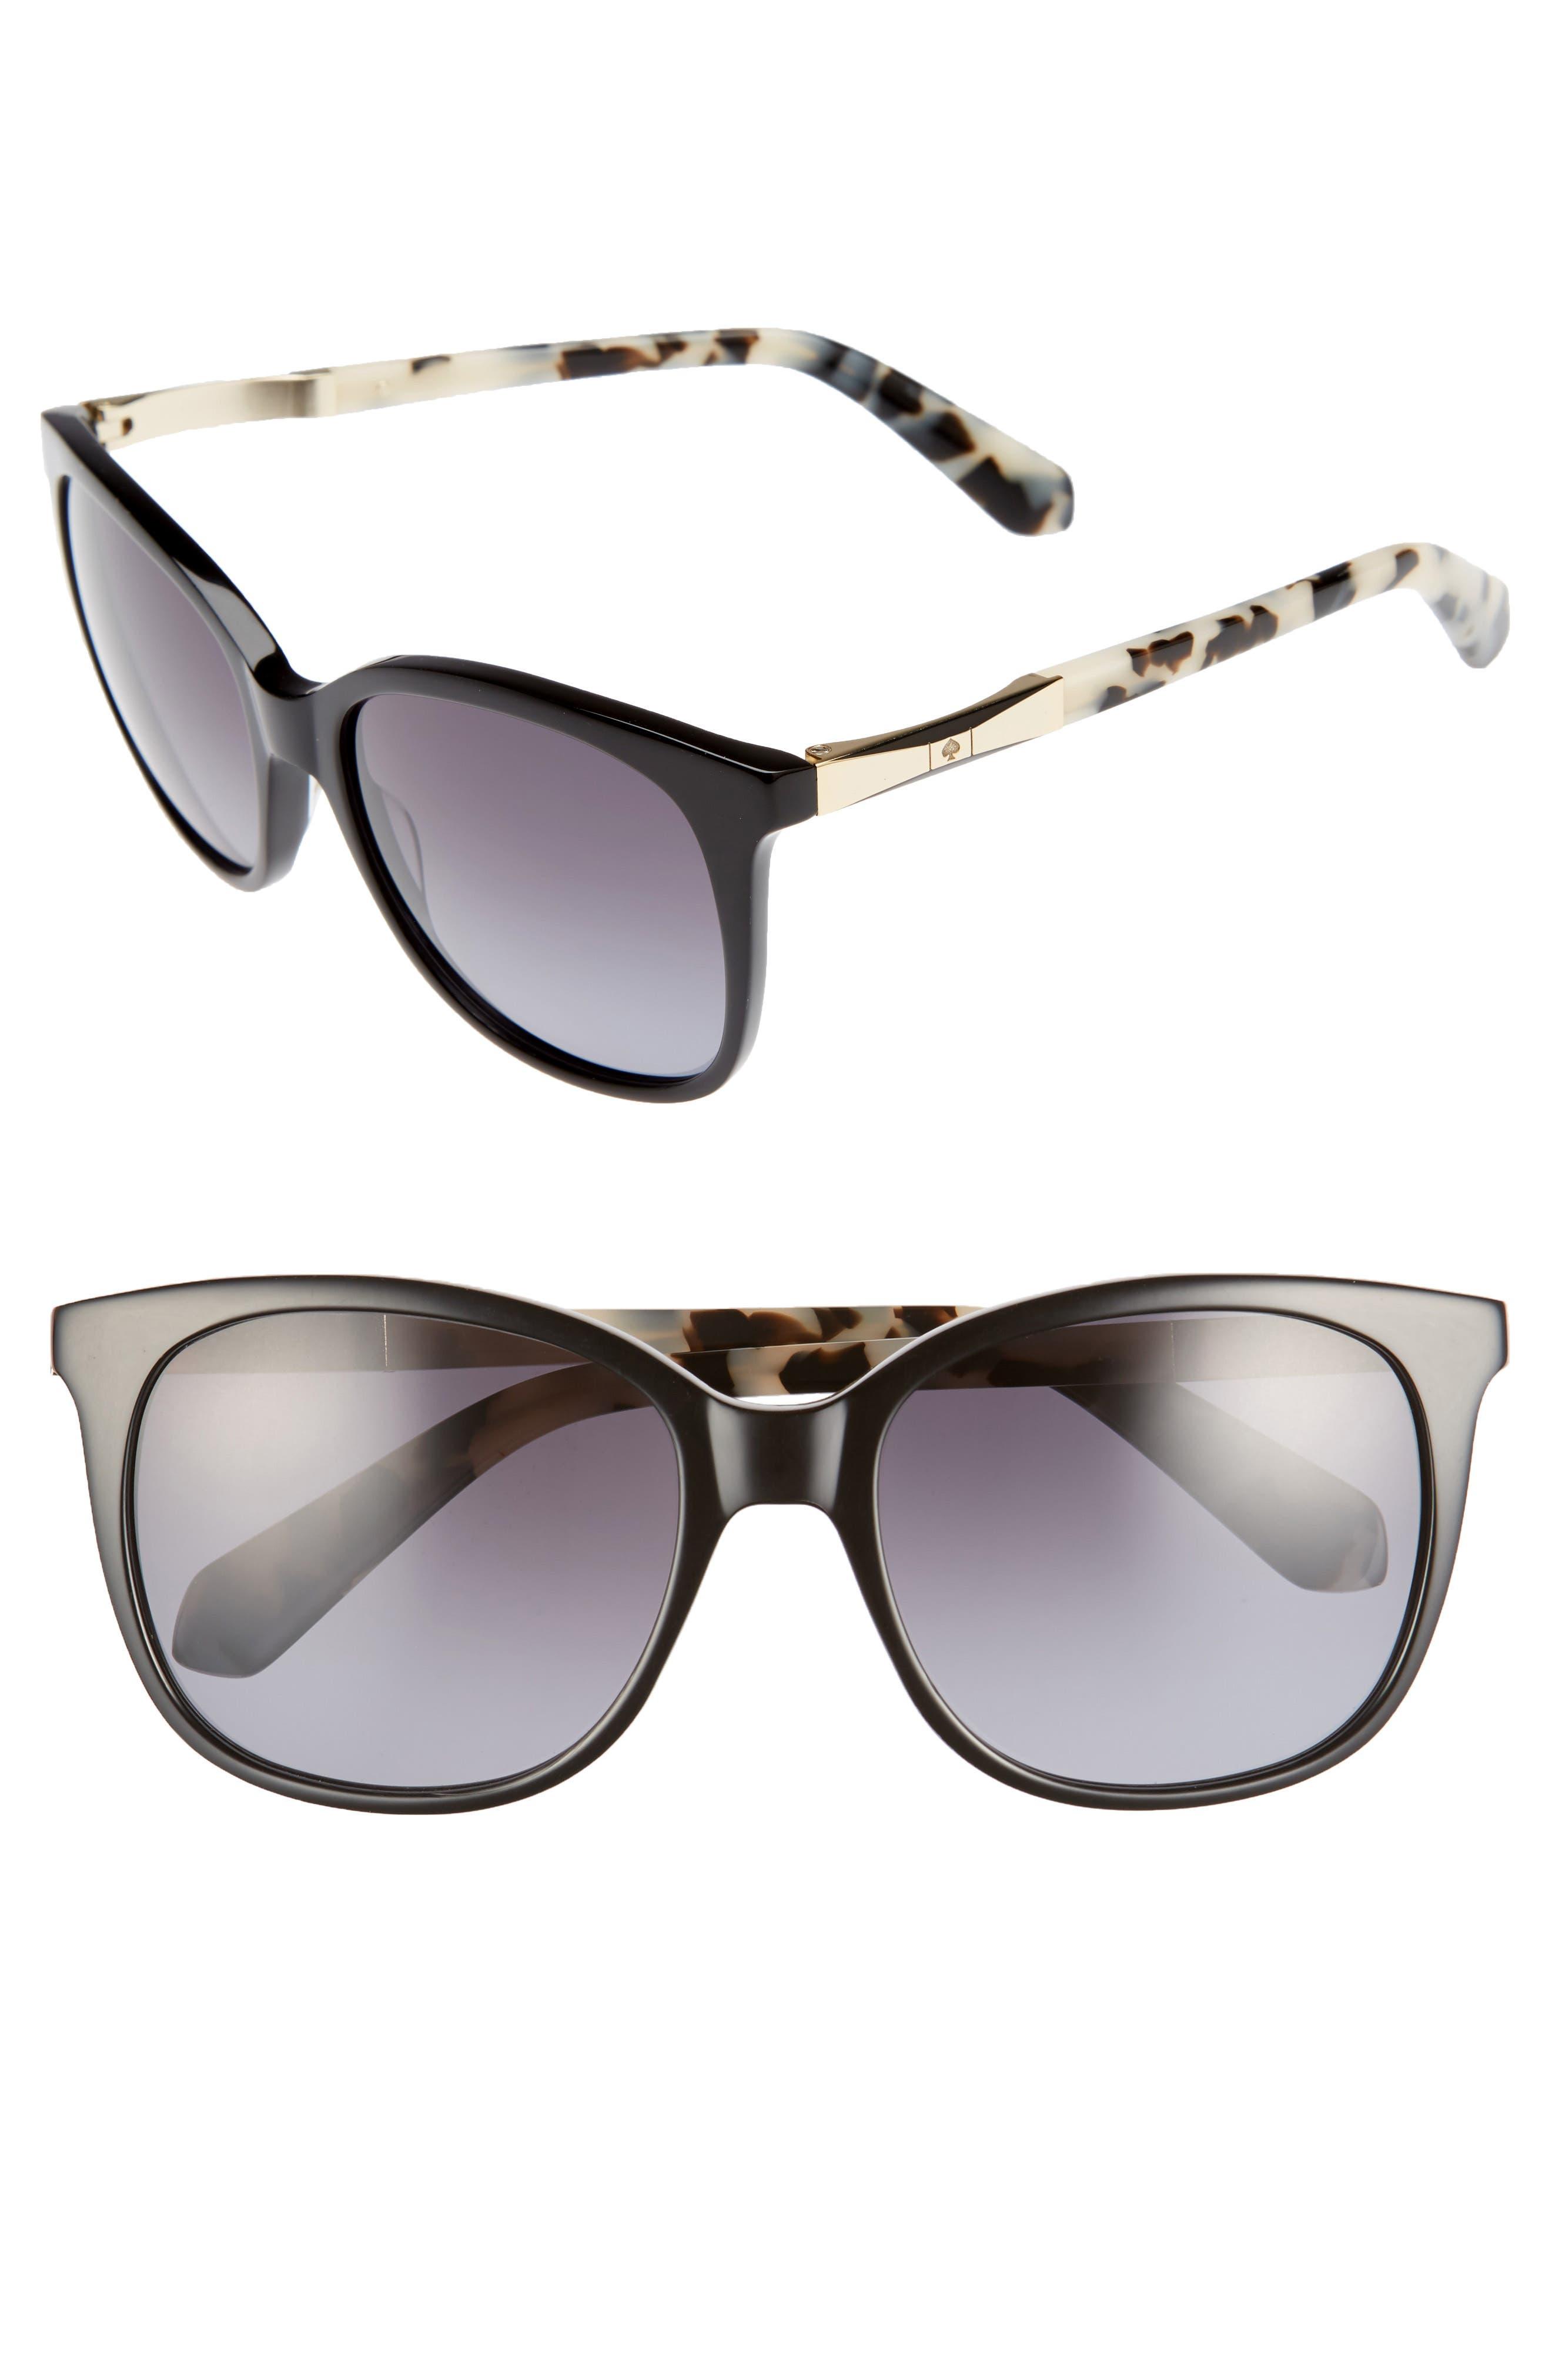 Main Image - kate spade new york julieanna 54mm polarized sunglasses